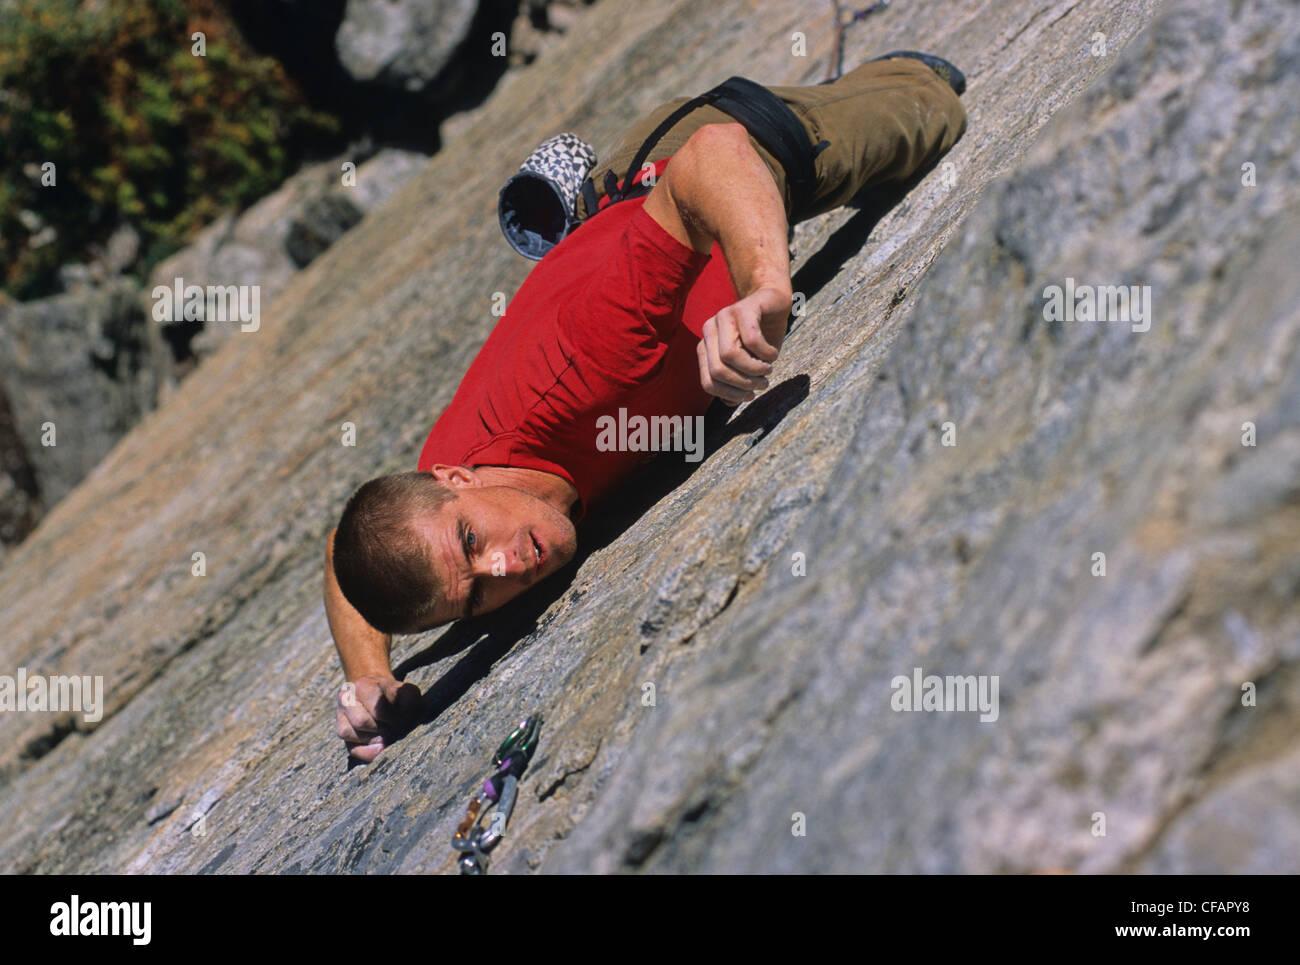 Rock climber, Doug Orr, climbing Naturopath 5.11b on The Doctor's Wall, Skaha Bluffs, Penticton, British Columbia, - Stock Image